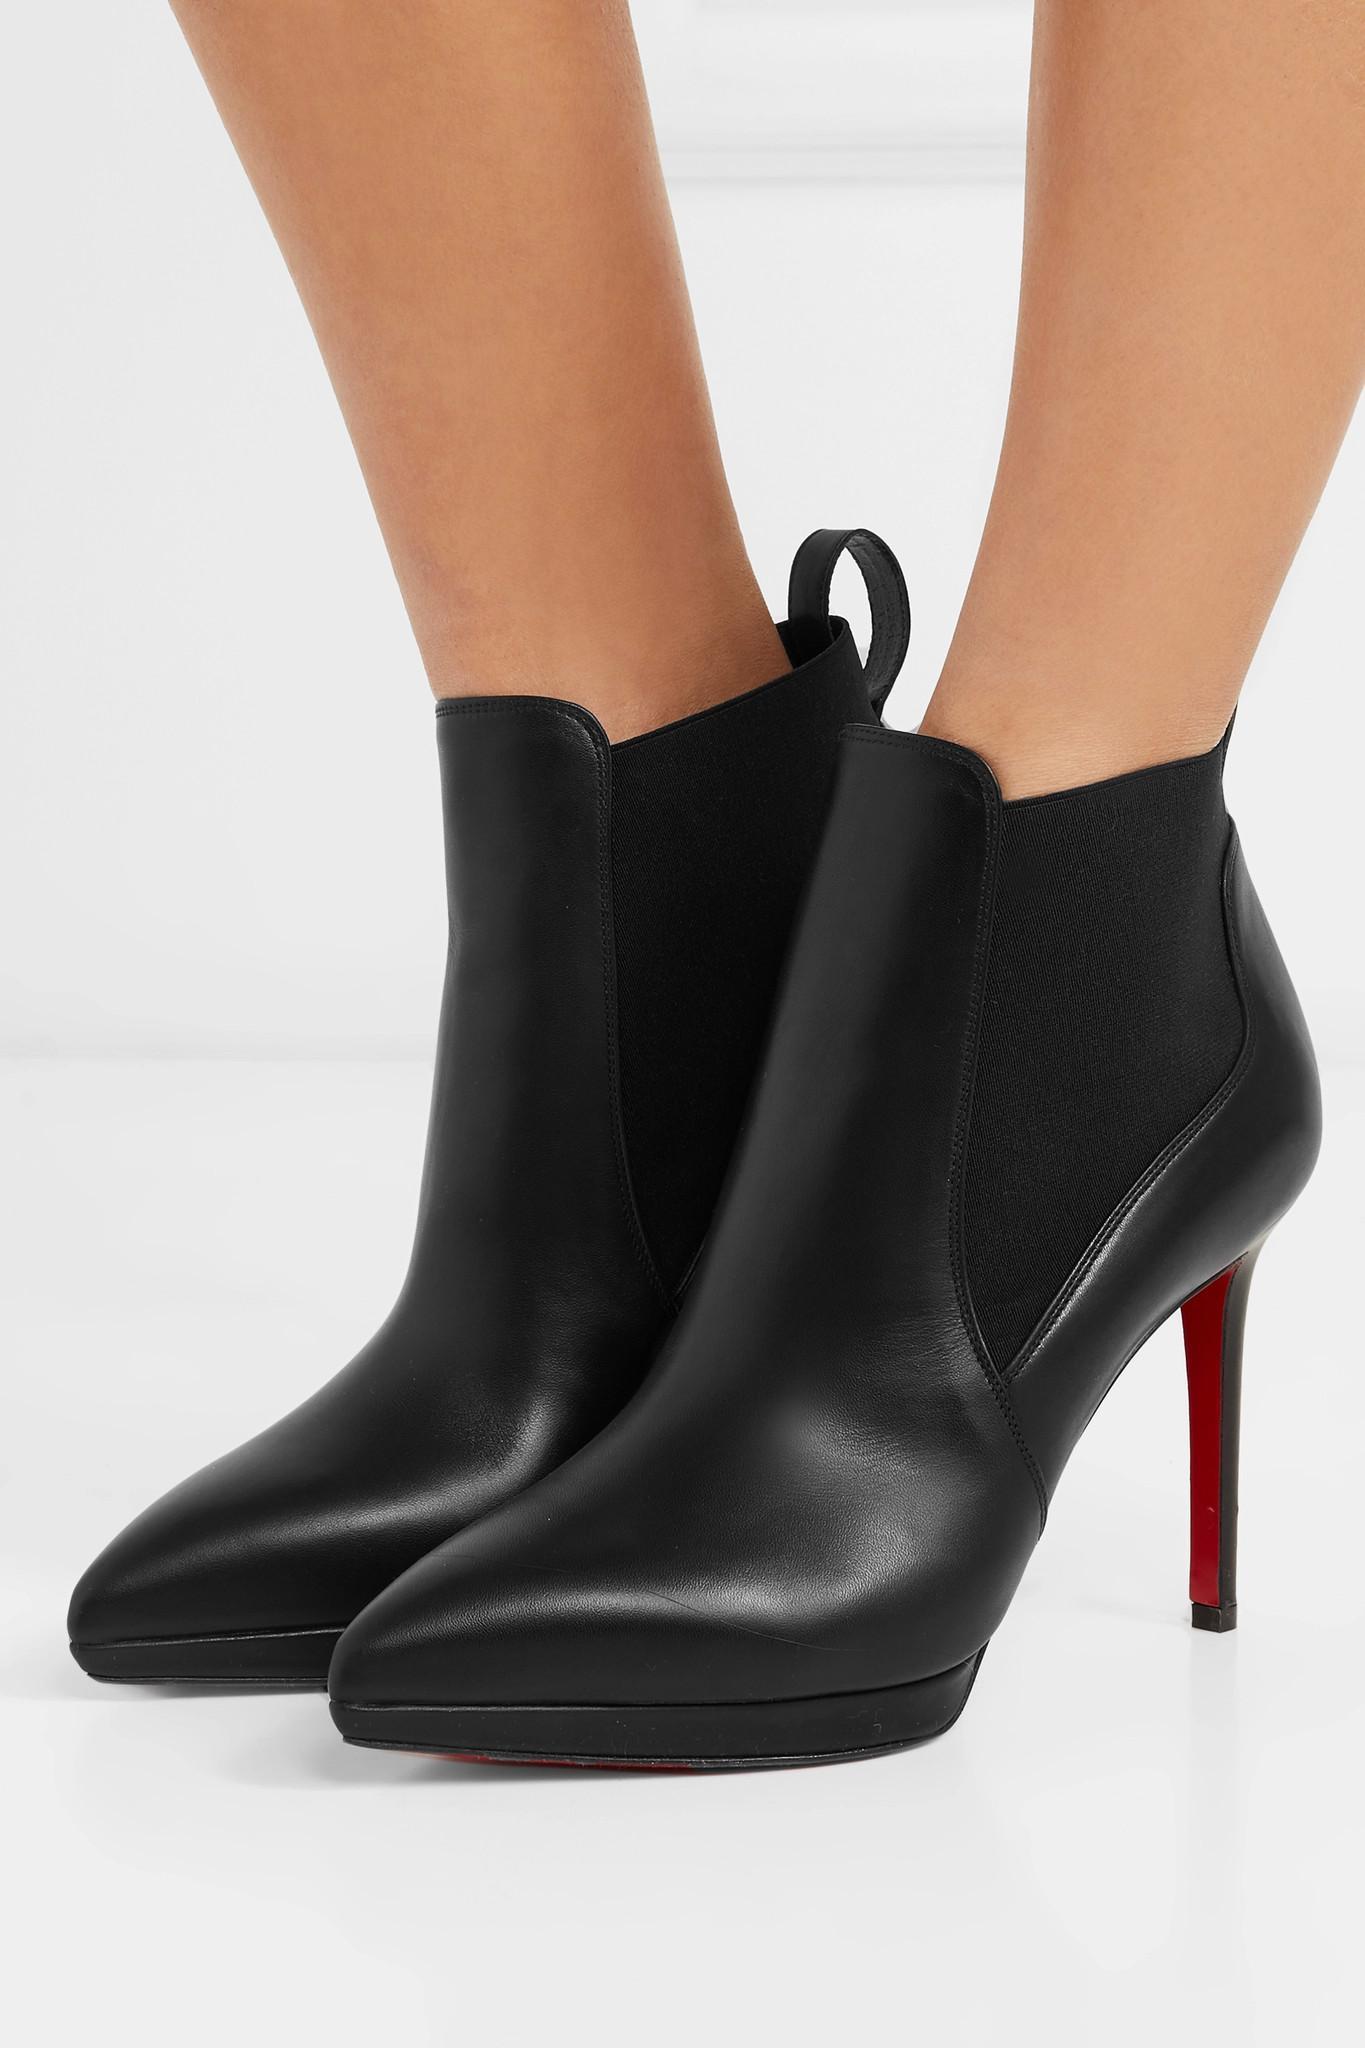 2b77fb38fb57 Christian Louboutin - Black Crochinetta 100 Leather Ankle Boots - Lyst.  View fullscreen